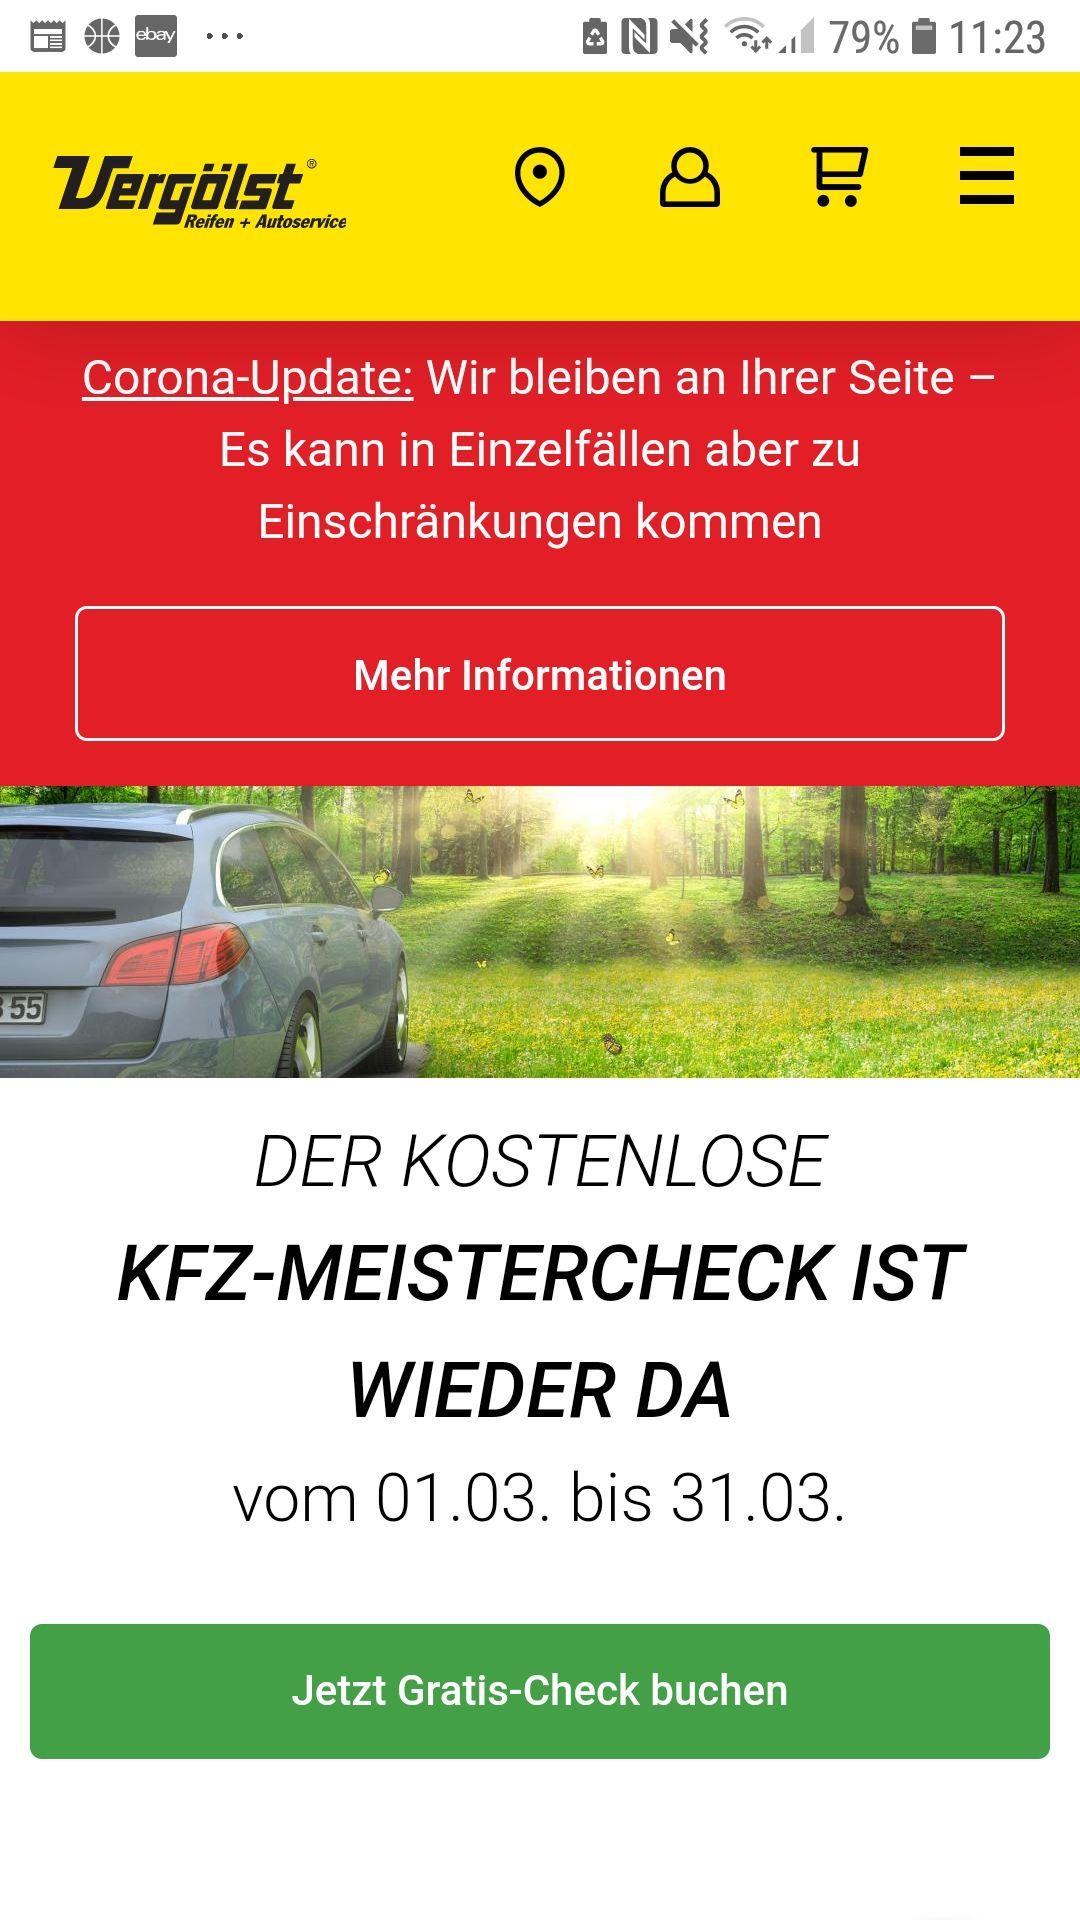 Vergölst kostenlose KFZ Prüftage vom 01.03-31.03